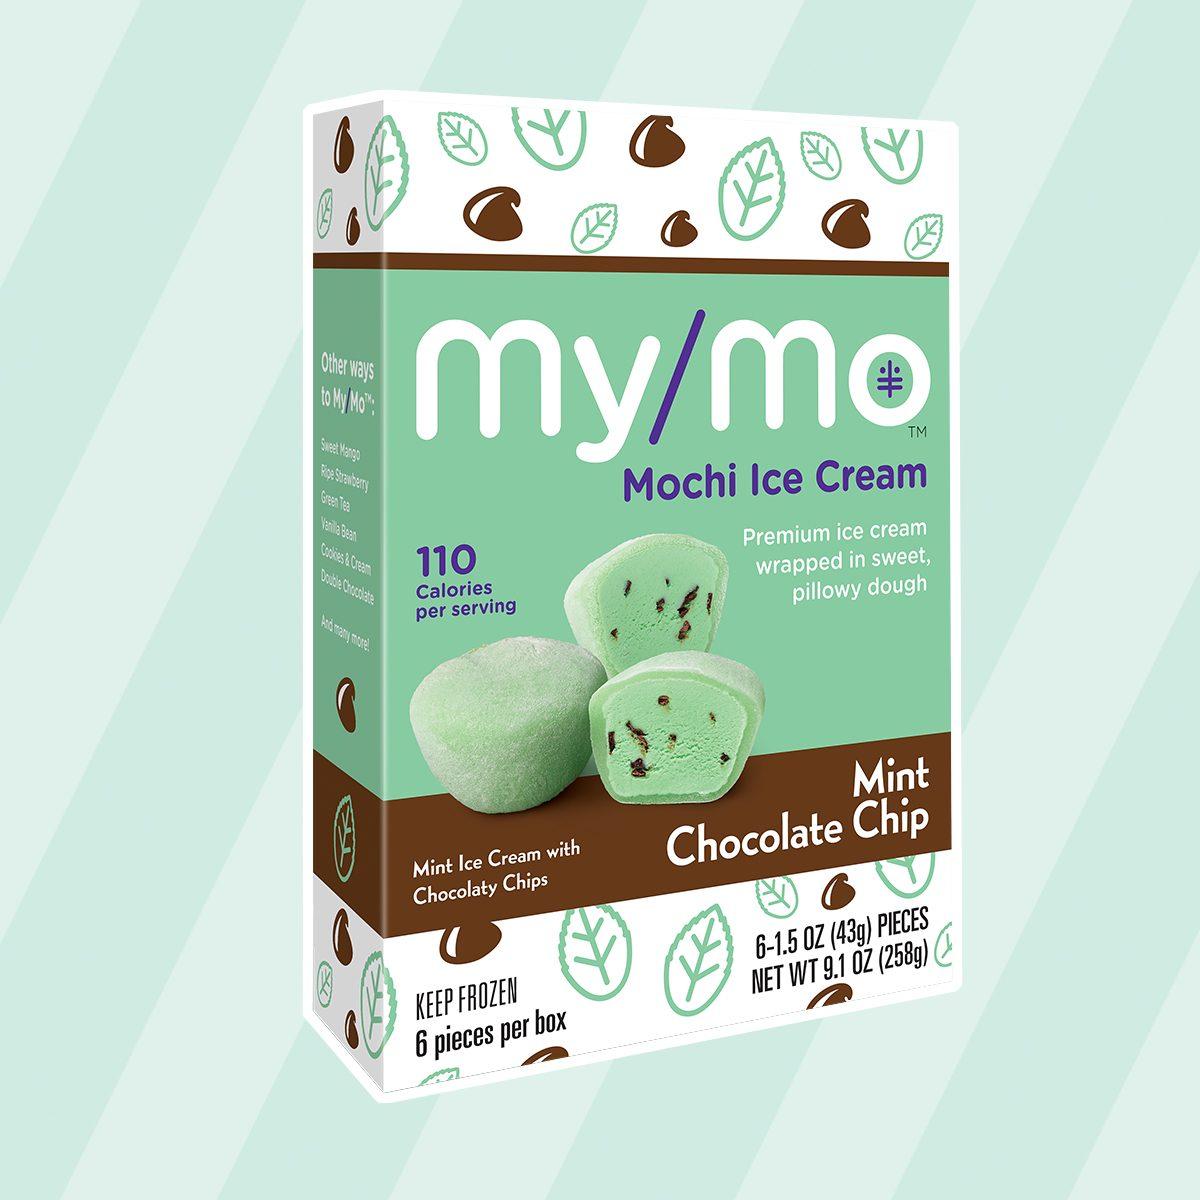 My/Mo Mochi Ice Cream